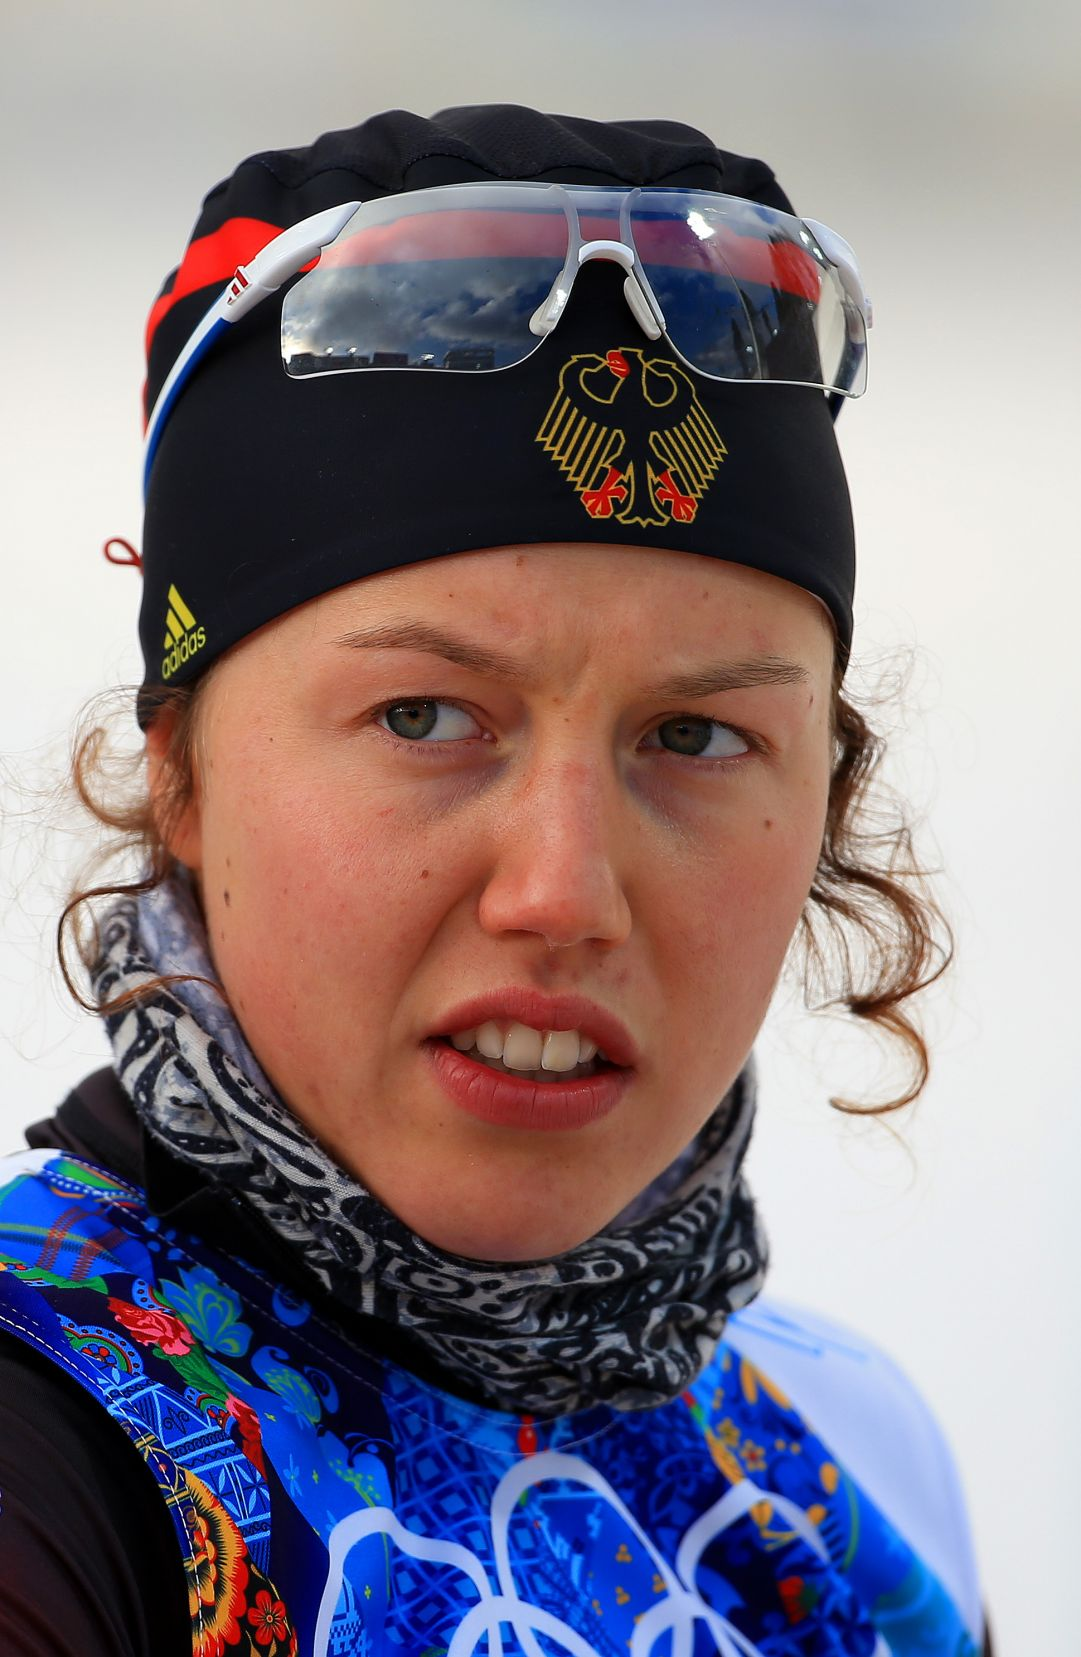 Laura Dahlmeyer